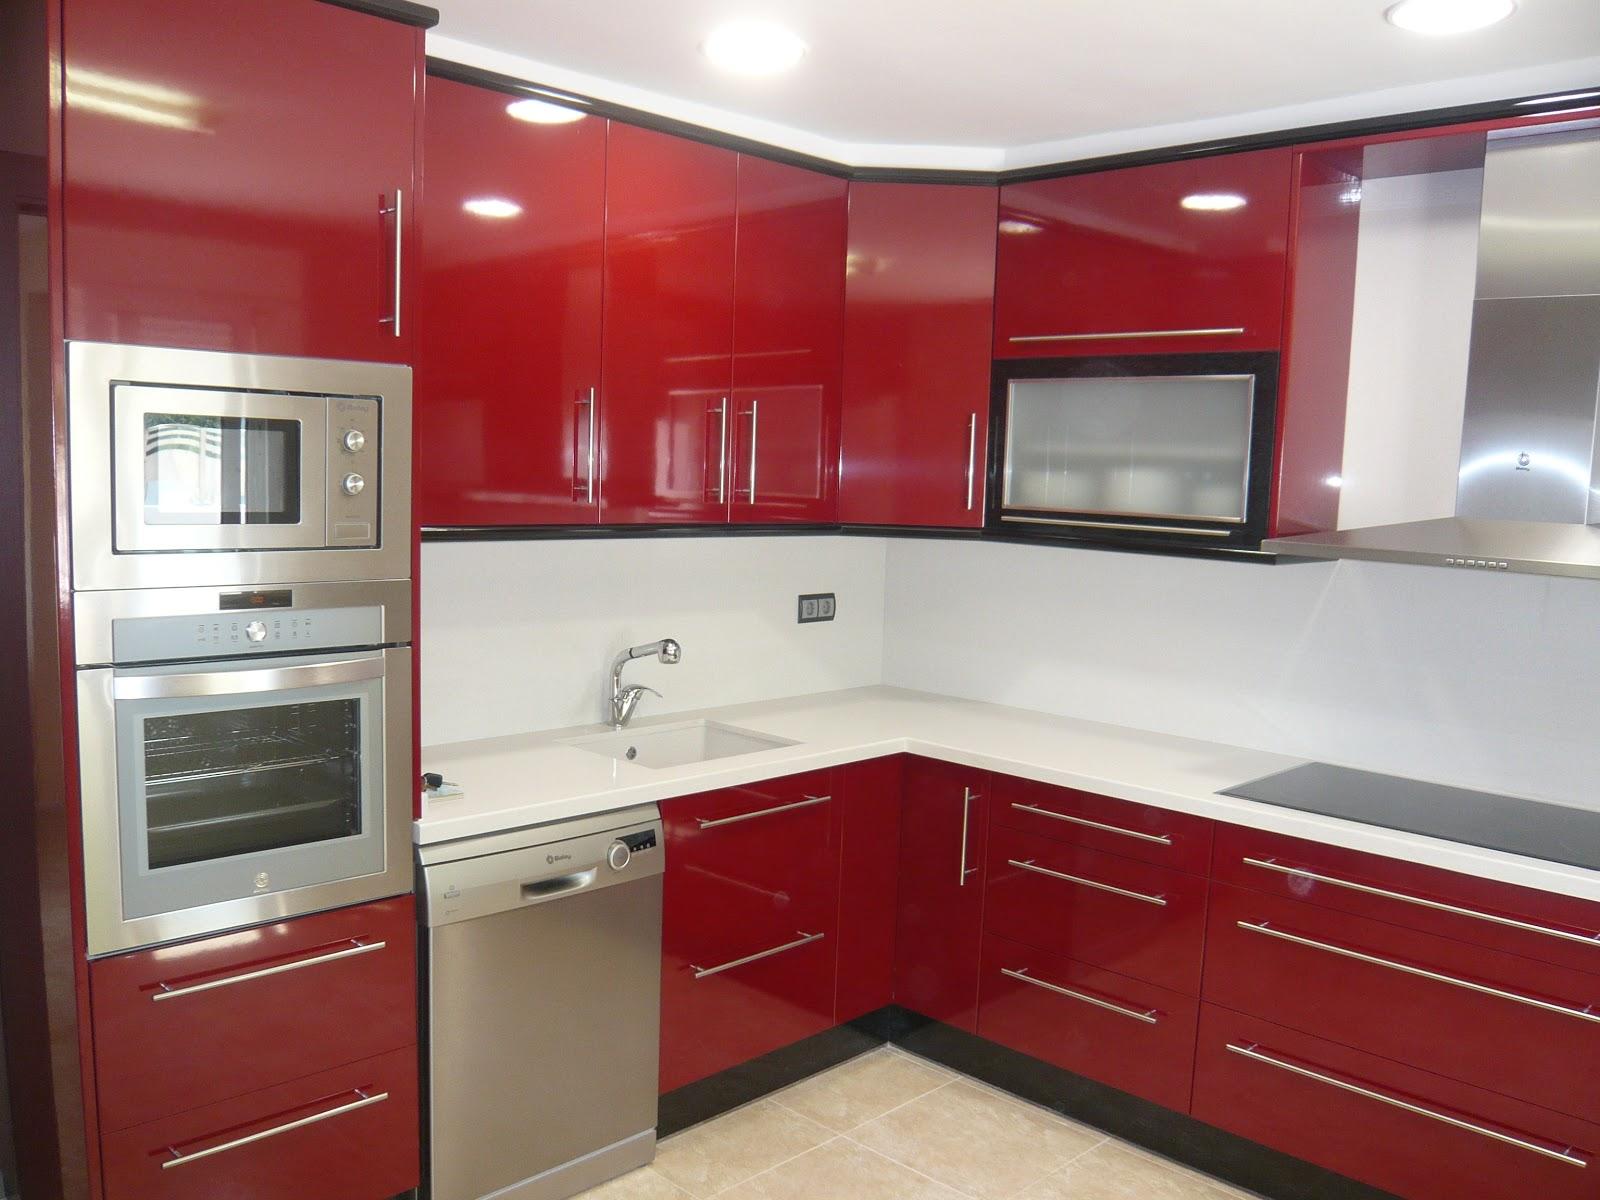 Reuscuina cocina de formica rojo negra - Formica para cocinas ...